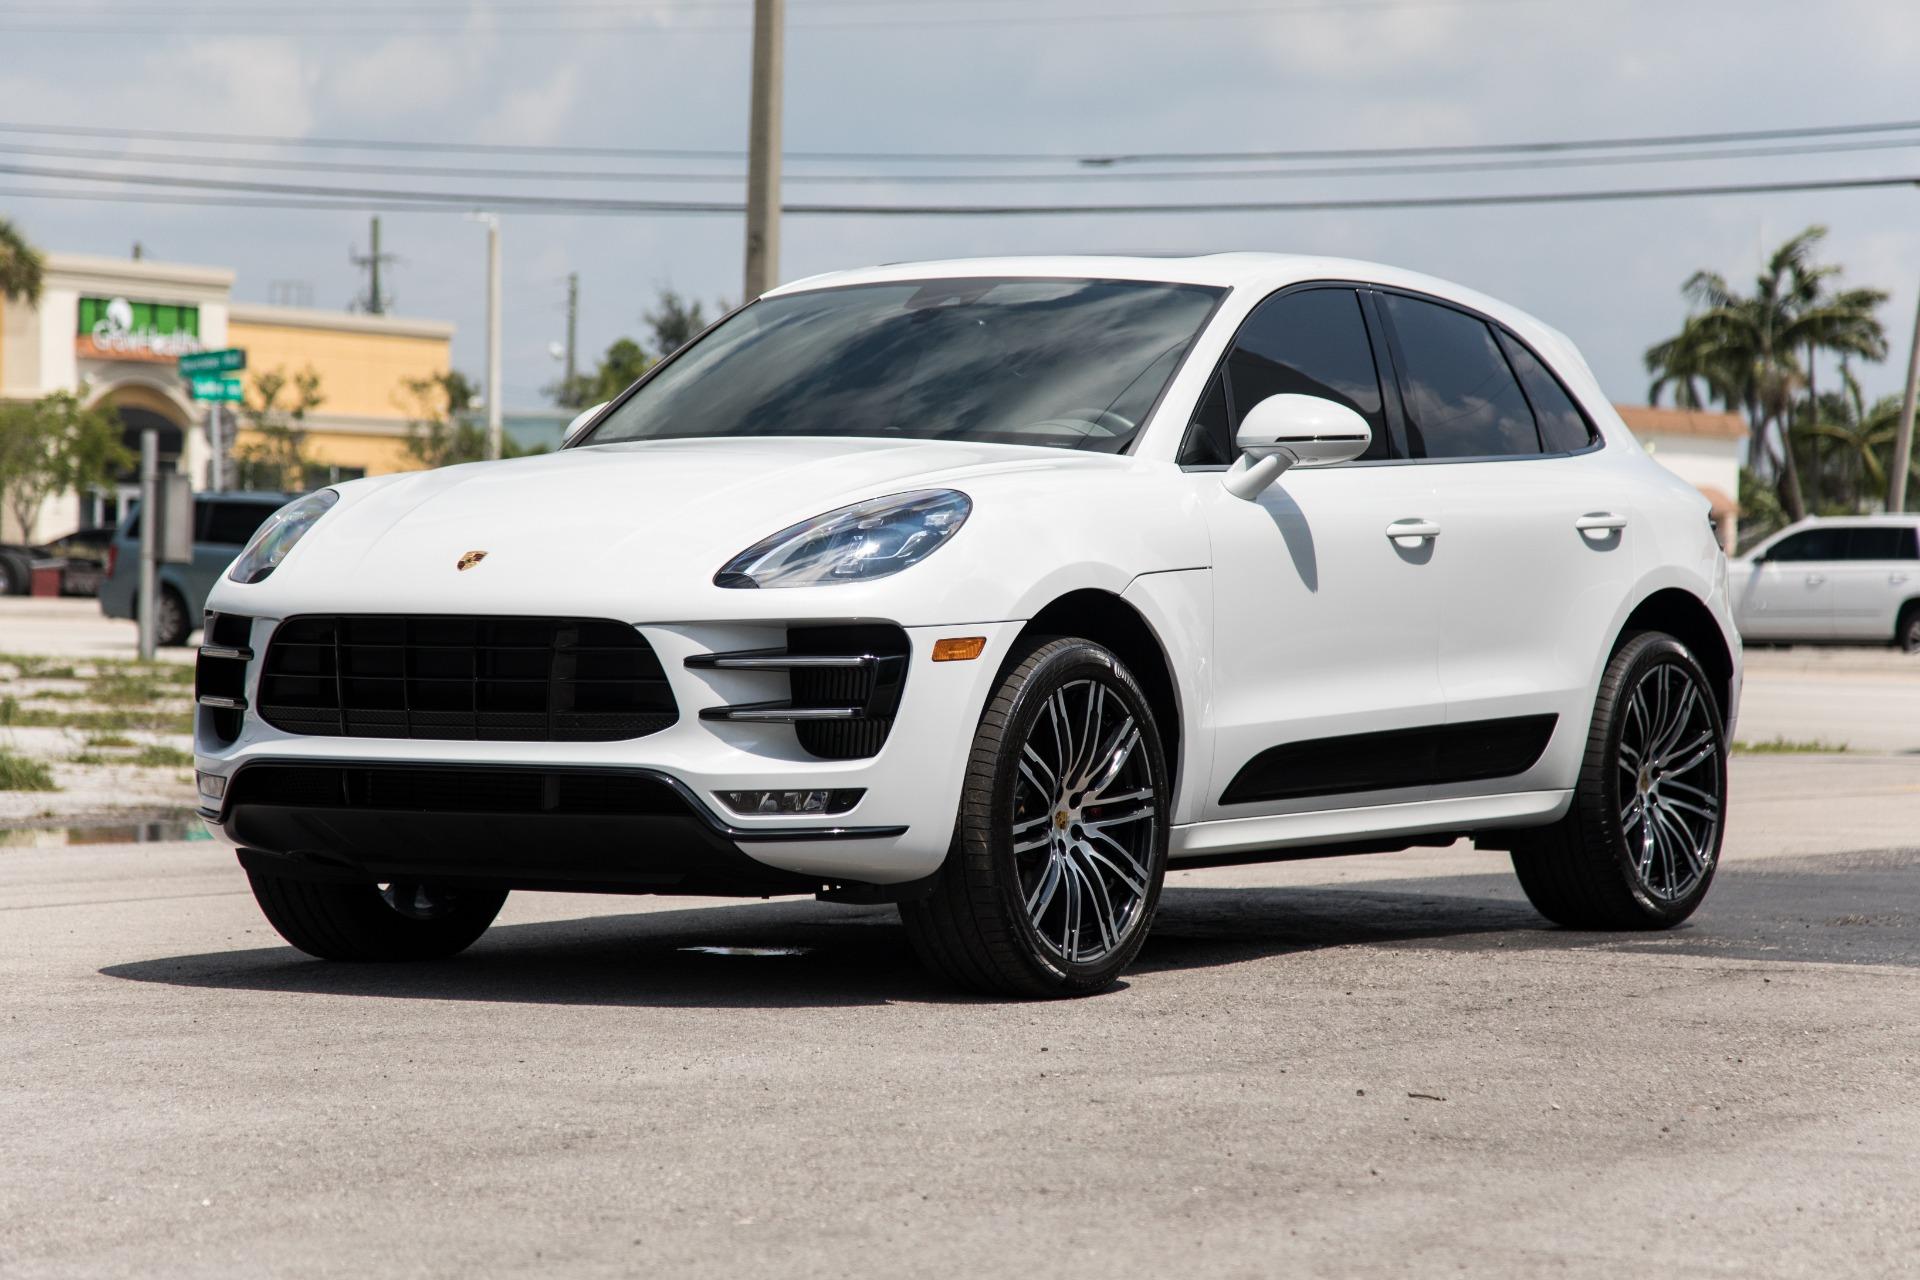 Used-2018-Porsche-Macan-Turbo